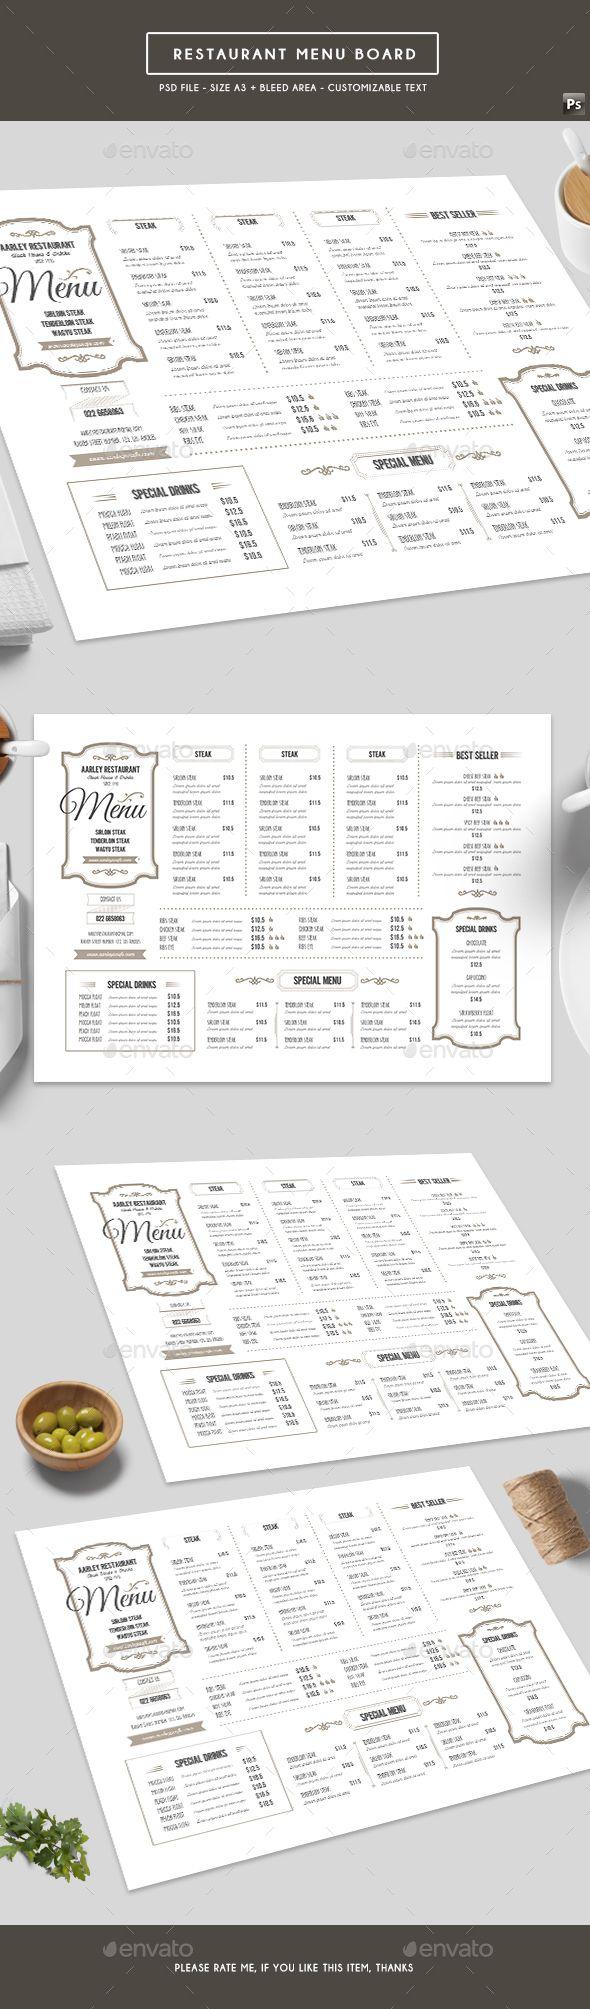 Restaurant Menu Board - Food Menus Print Templates Download here : https://graphicriver.net/item/restaurant-menu-board/19411860?s_rank=5&ref=Al-fatih